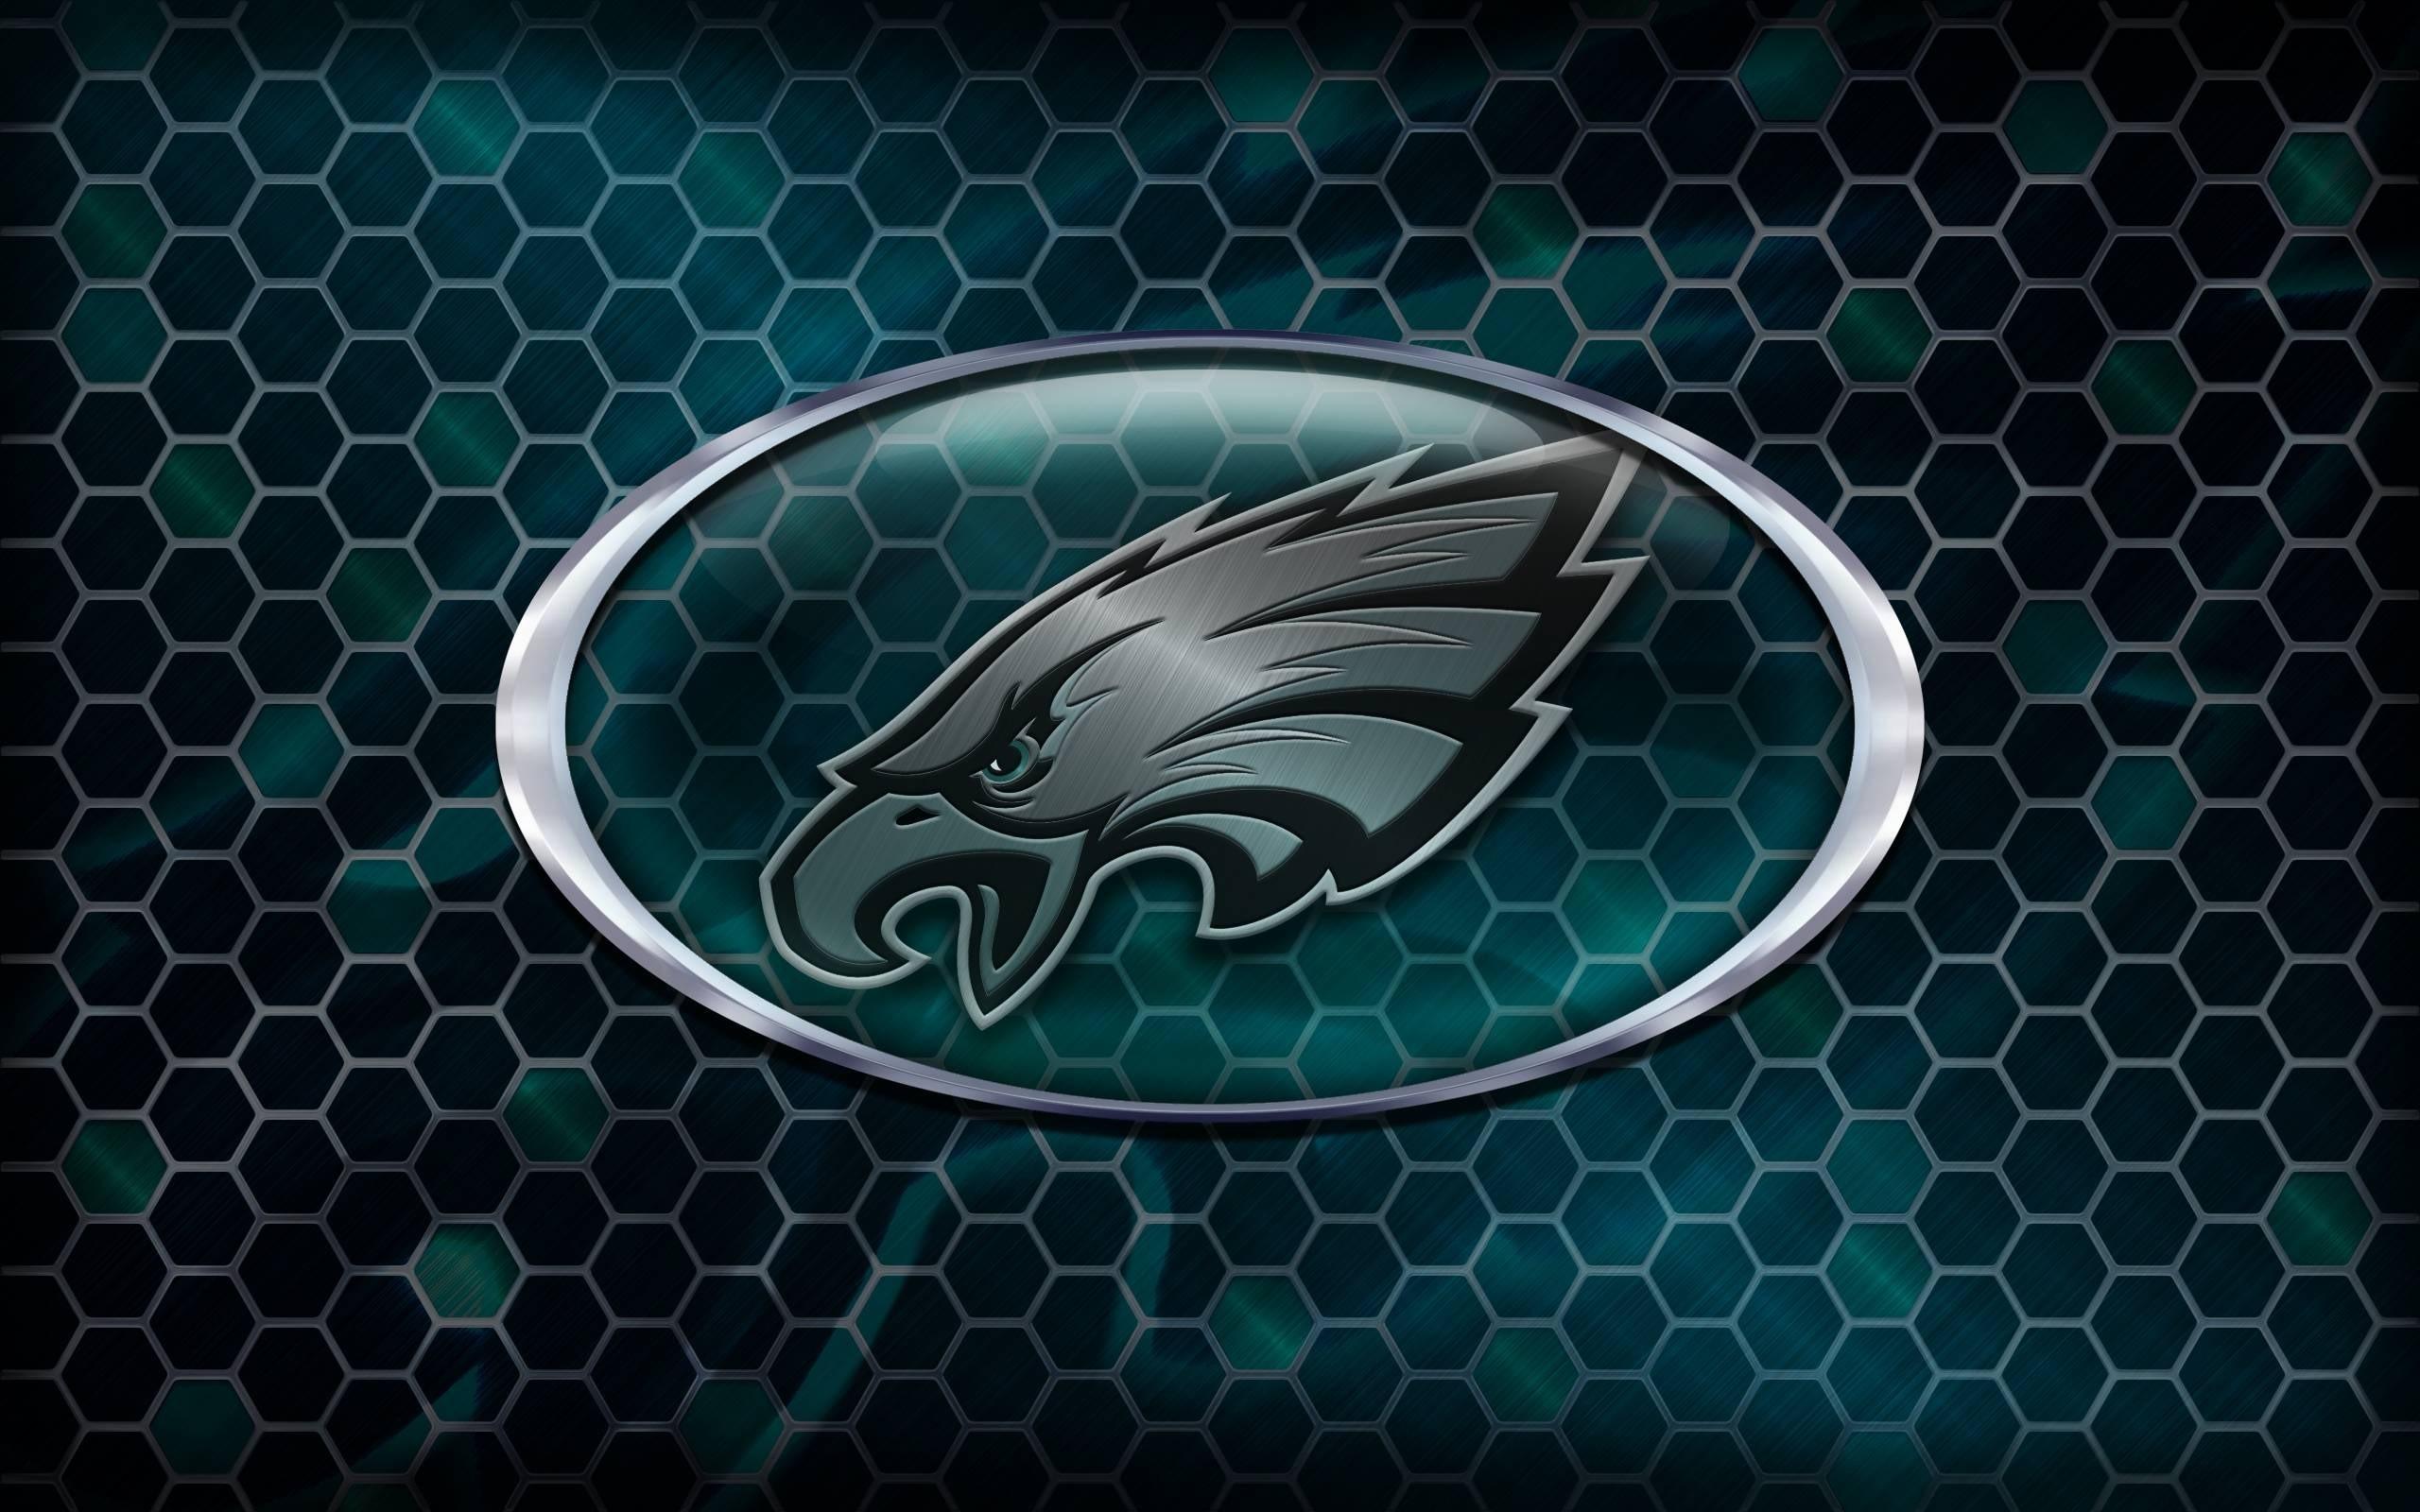 philadelphia eagles logo wallpapers hd background download free